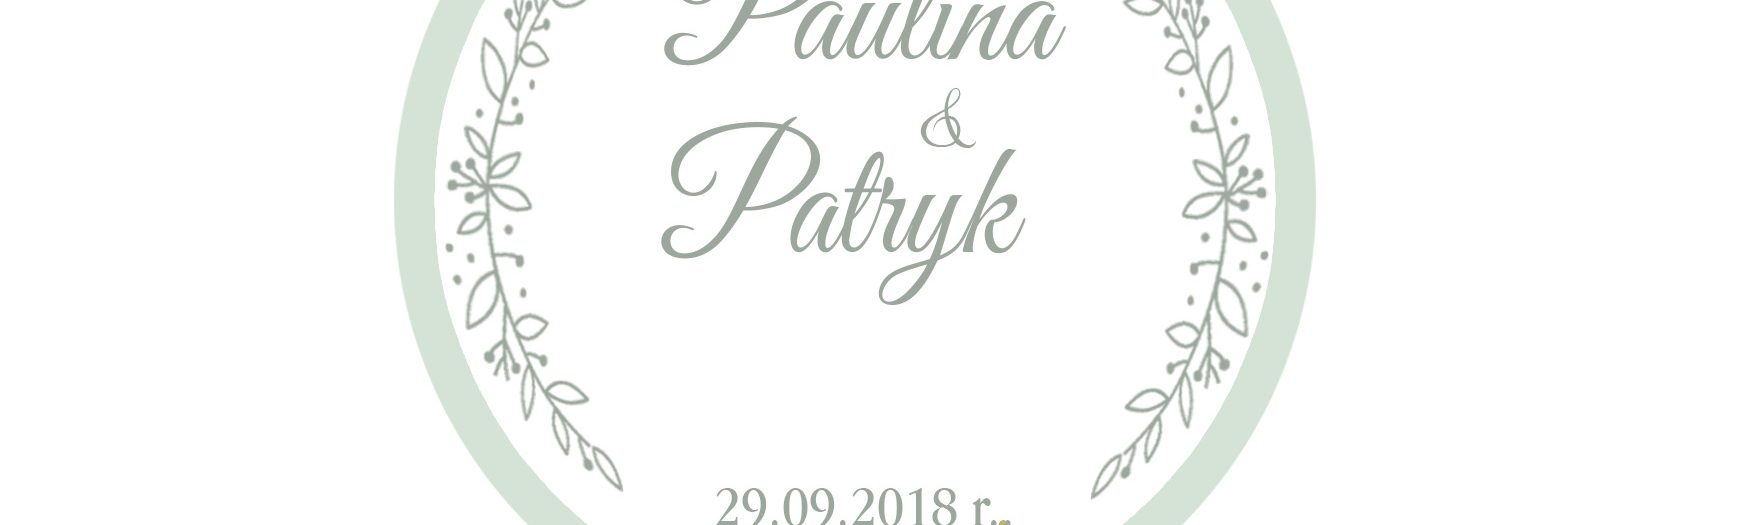 Paulina & Patryk wesele wrzesień 2018